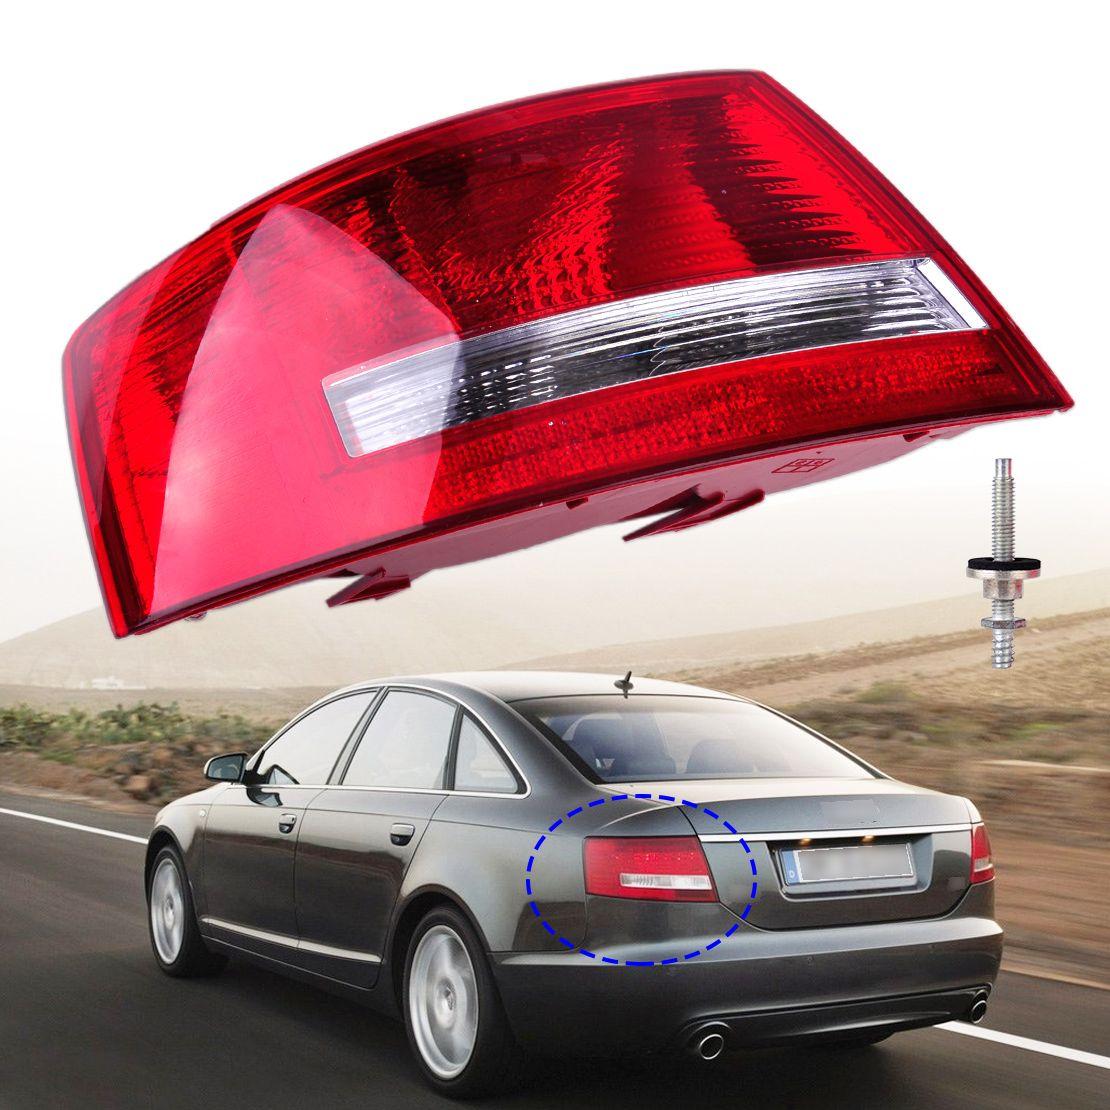 Left Tail Light Assembly Lamp Housing Without Bulb 4f5 945 095 L 4f5 945 095 D For Audi A6 Quattro A6 2005 2006 2007 2008 Sedan Audi A6 Quattro Sedan Audi A6